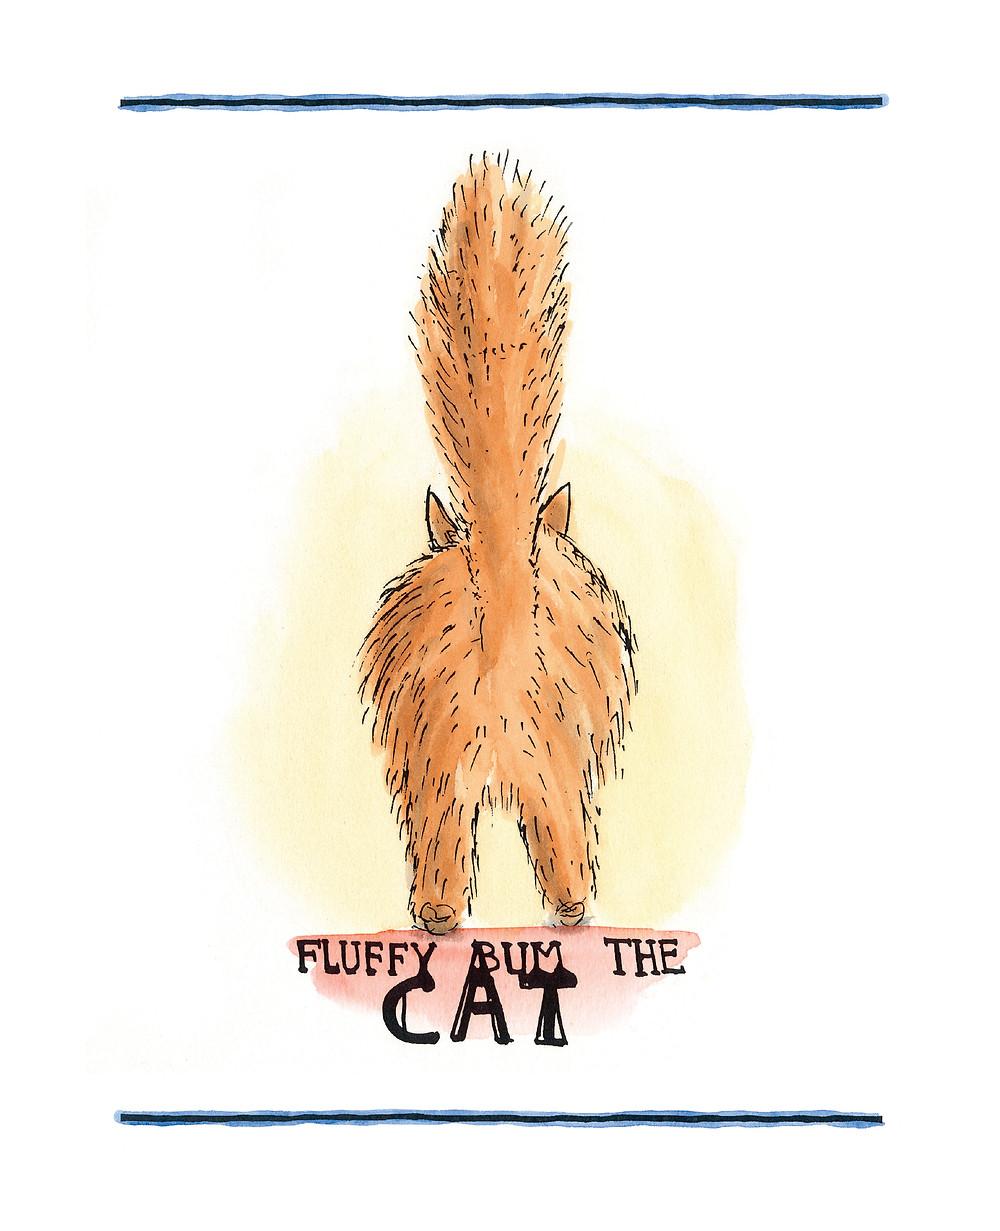 fluffybum the cat copyright Spike milligan